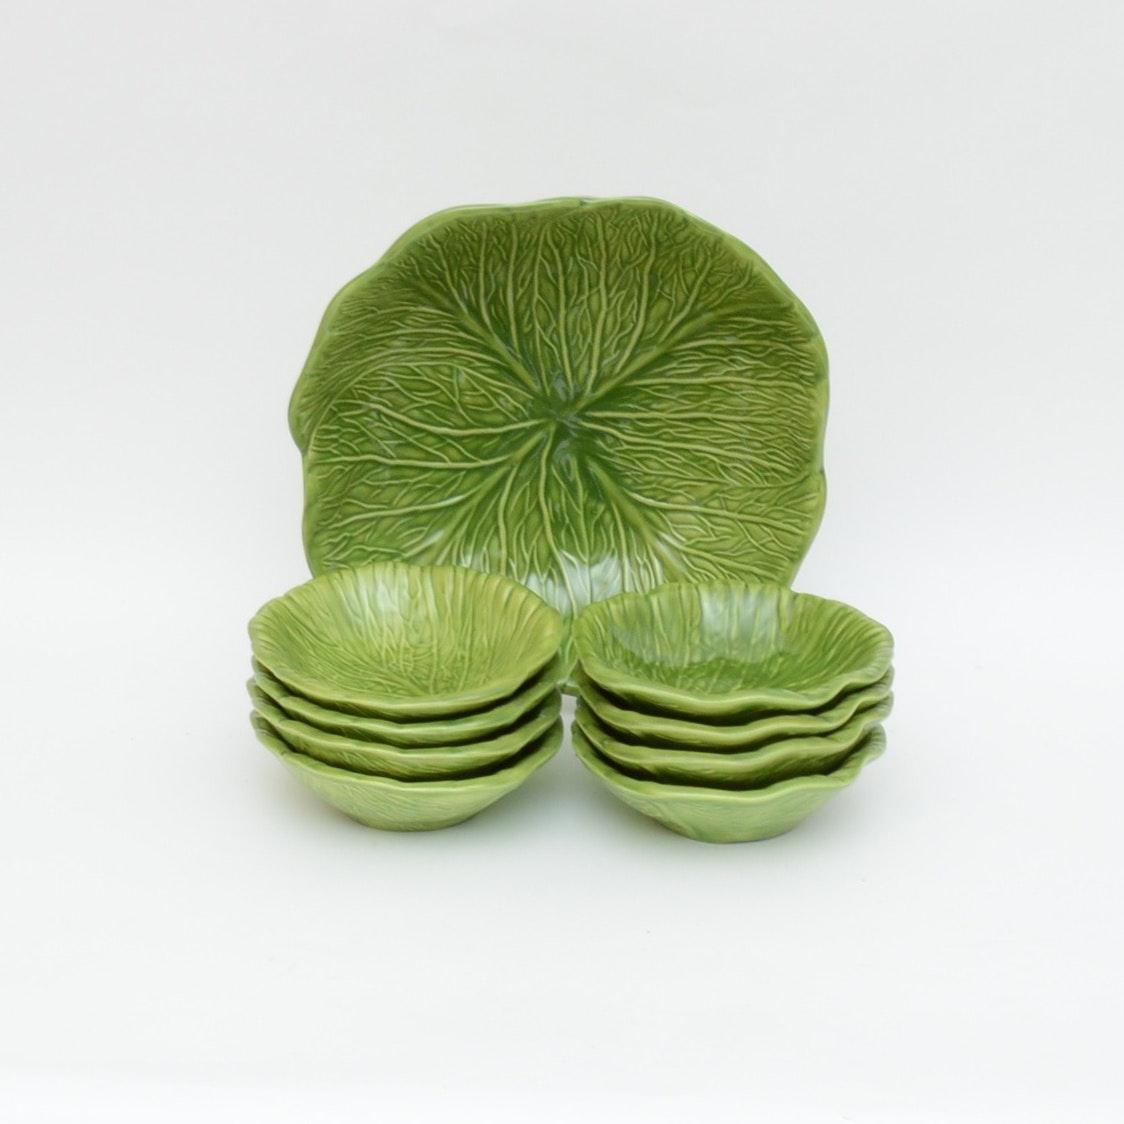 Cabbage Salad Bowl and Serving Bowls